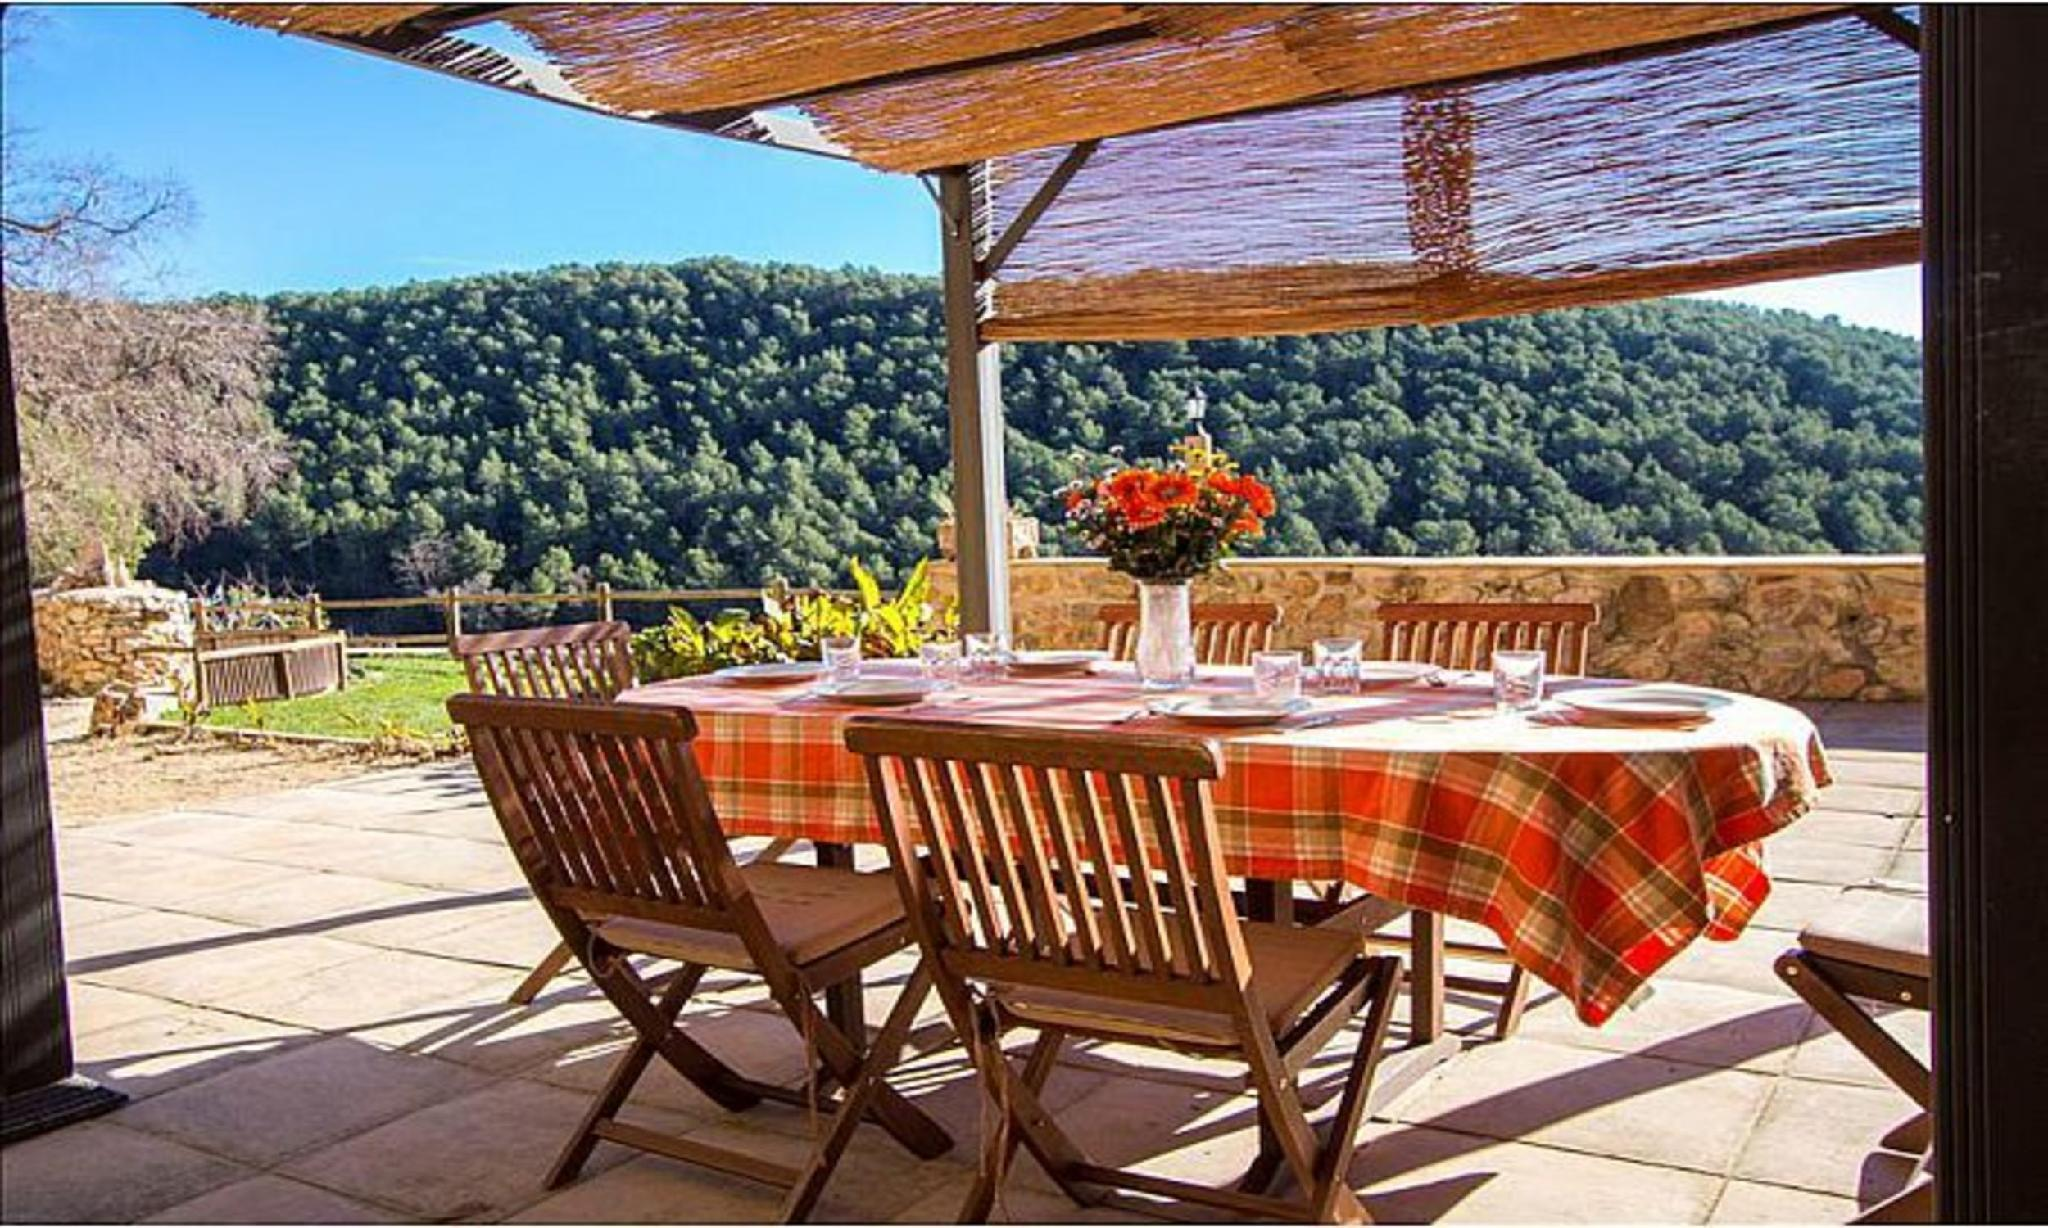 104735 - Villa In Tarragona Juncosa Spain